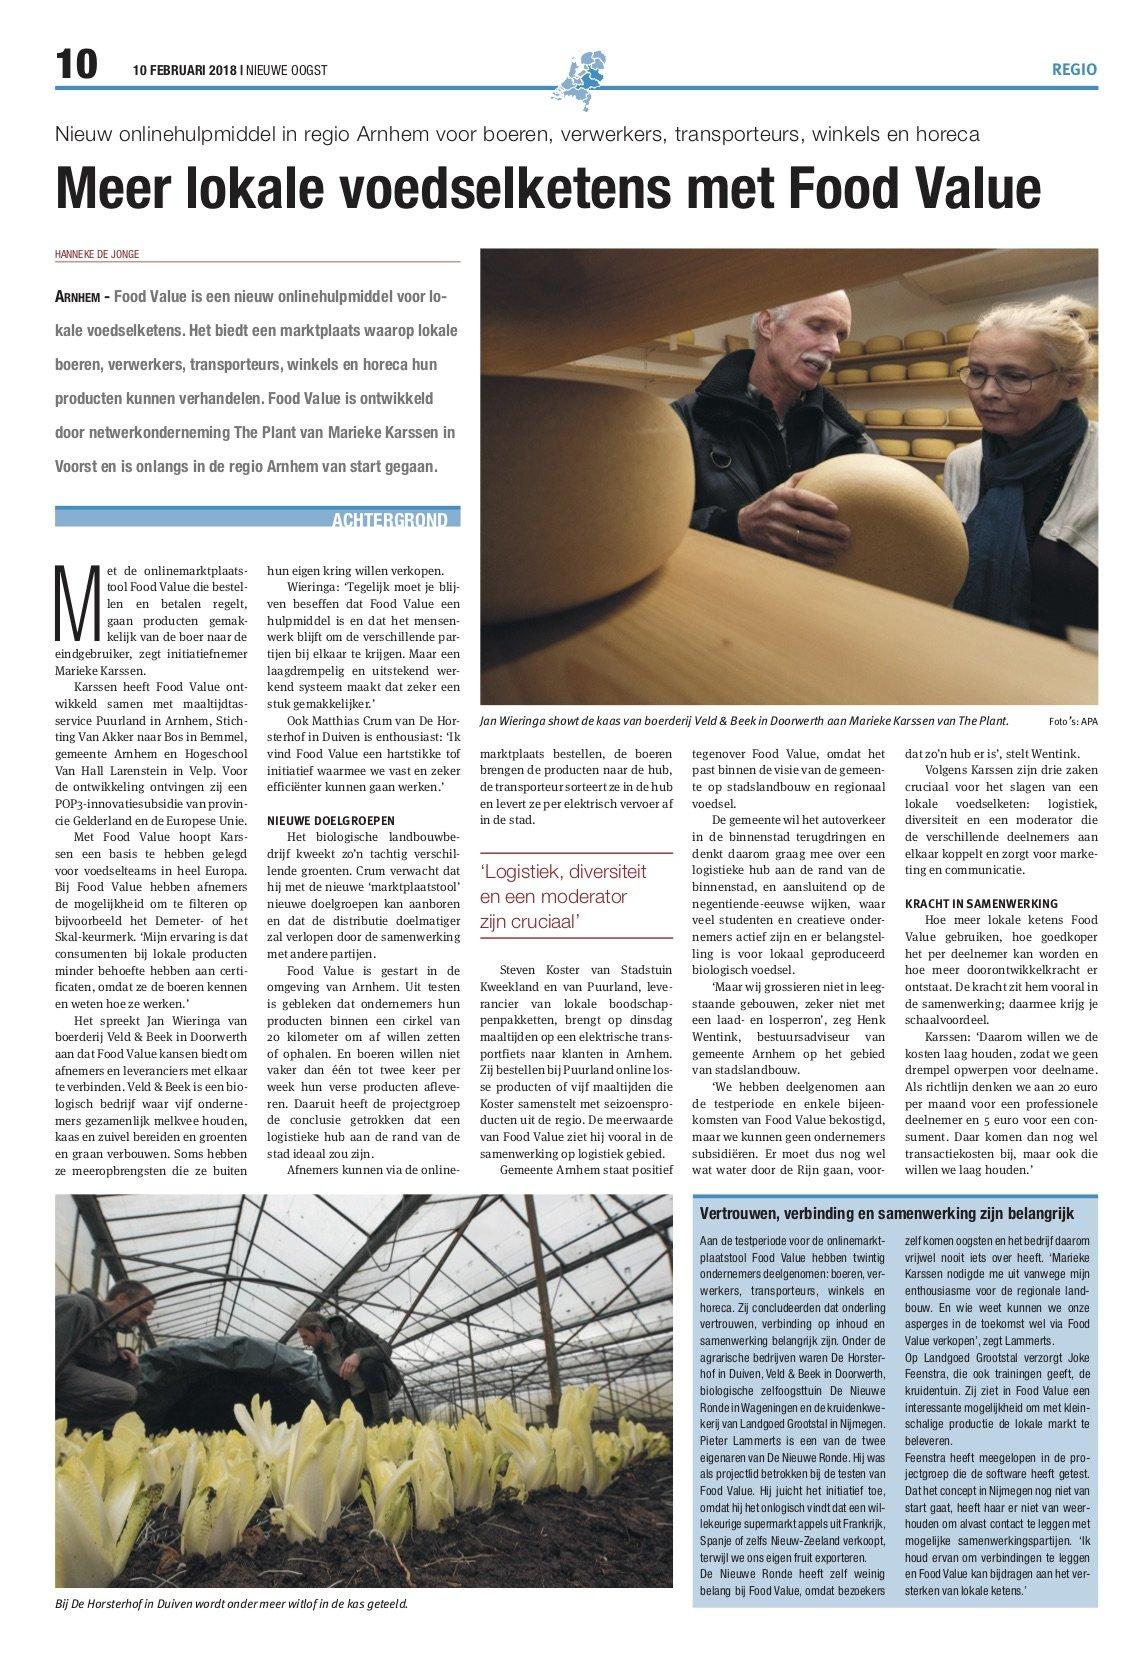 Artikel in nieuwe oogst over Food Value